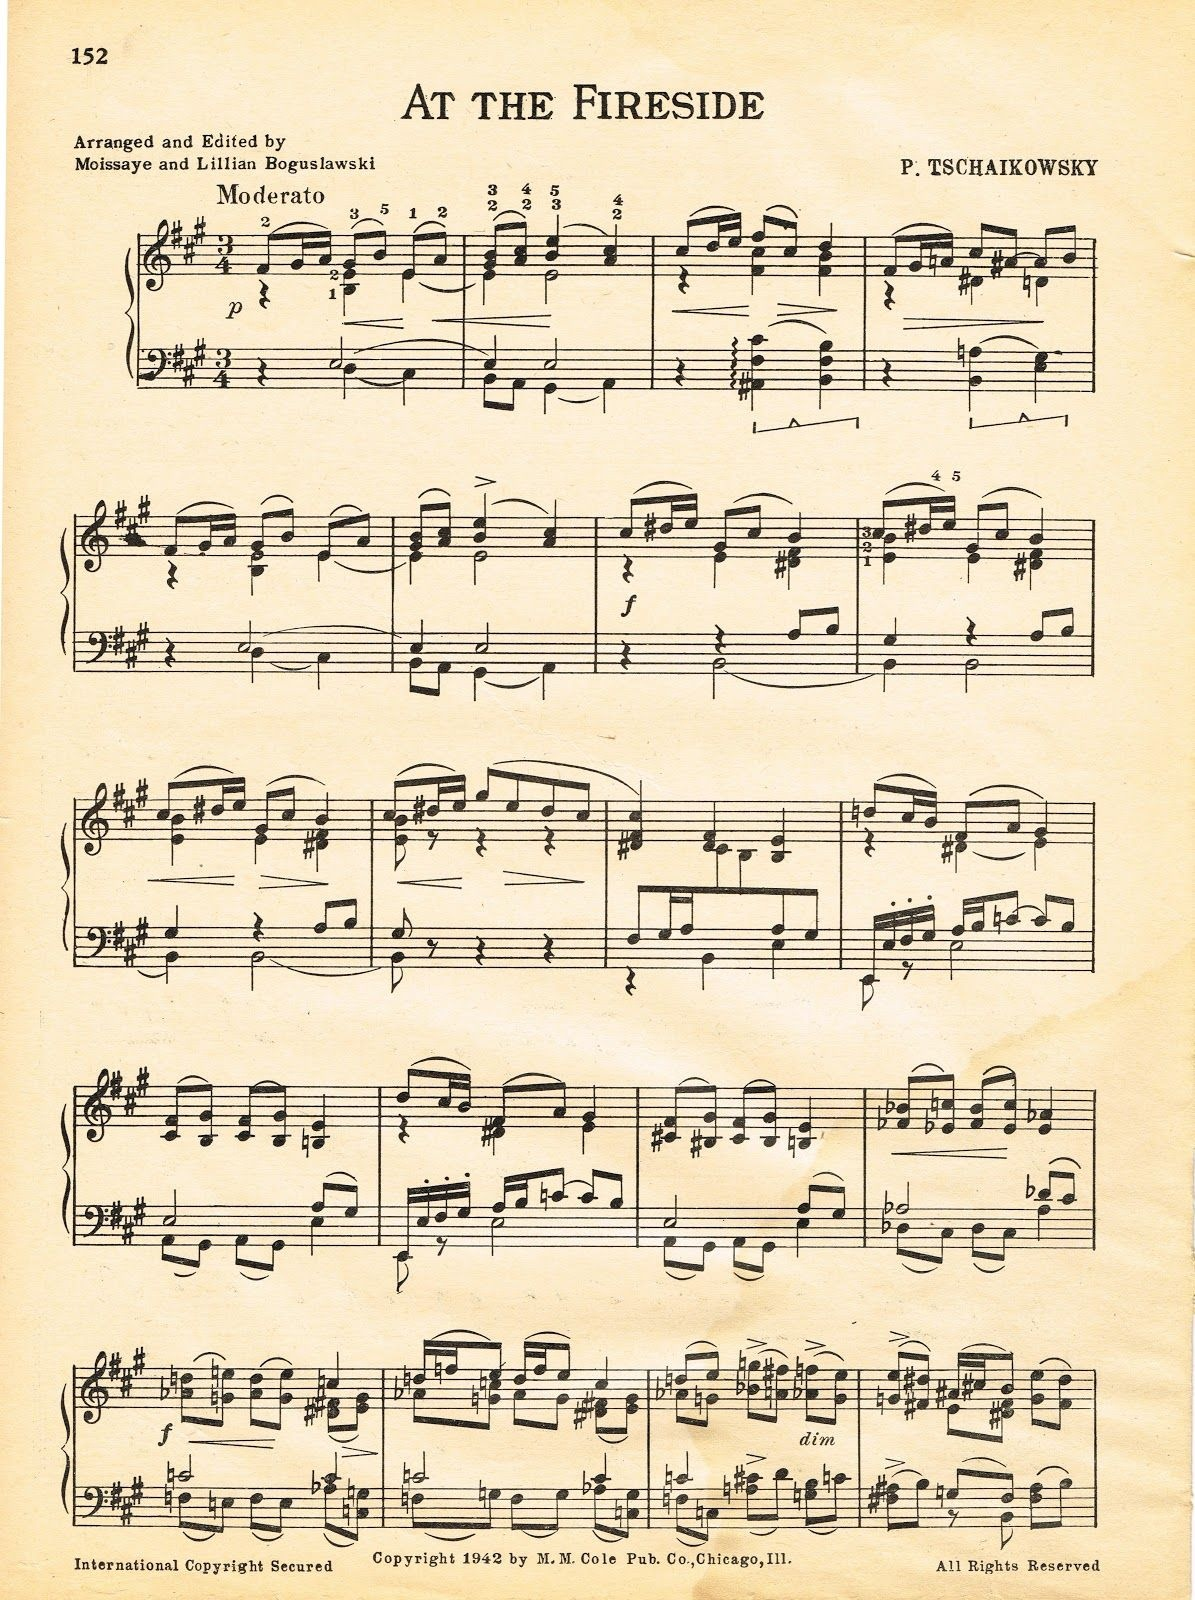 Antique Graphics Wednesday – At The Fireside Sheet Music - Christmas Carols Sheet Music Free Printable